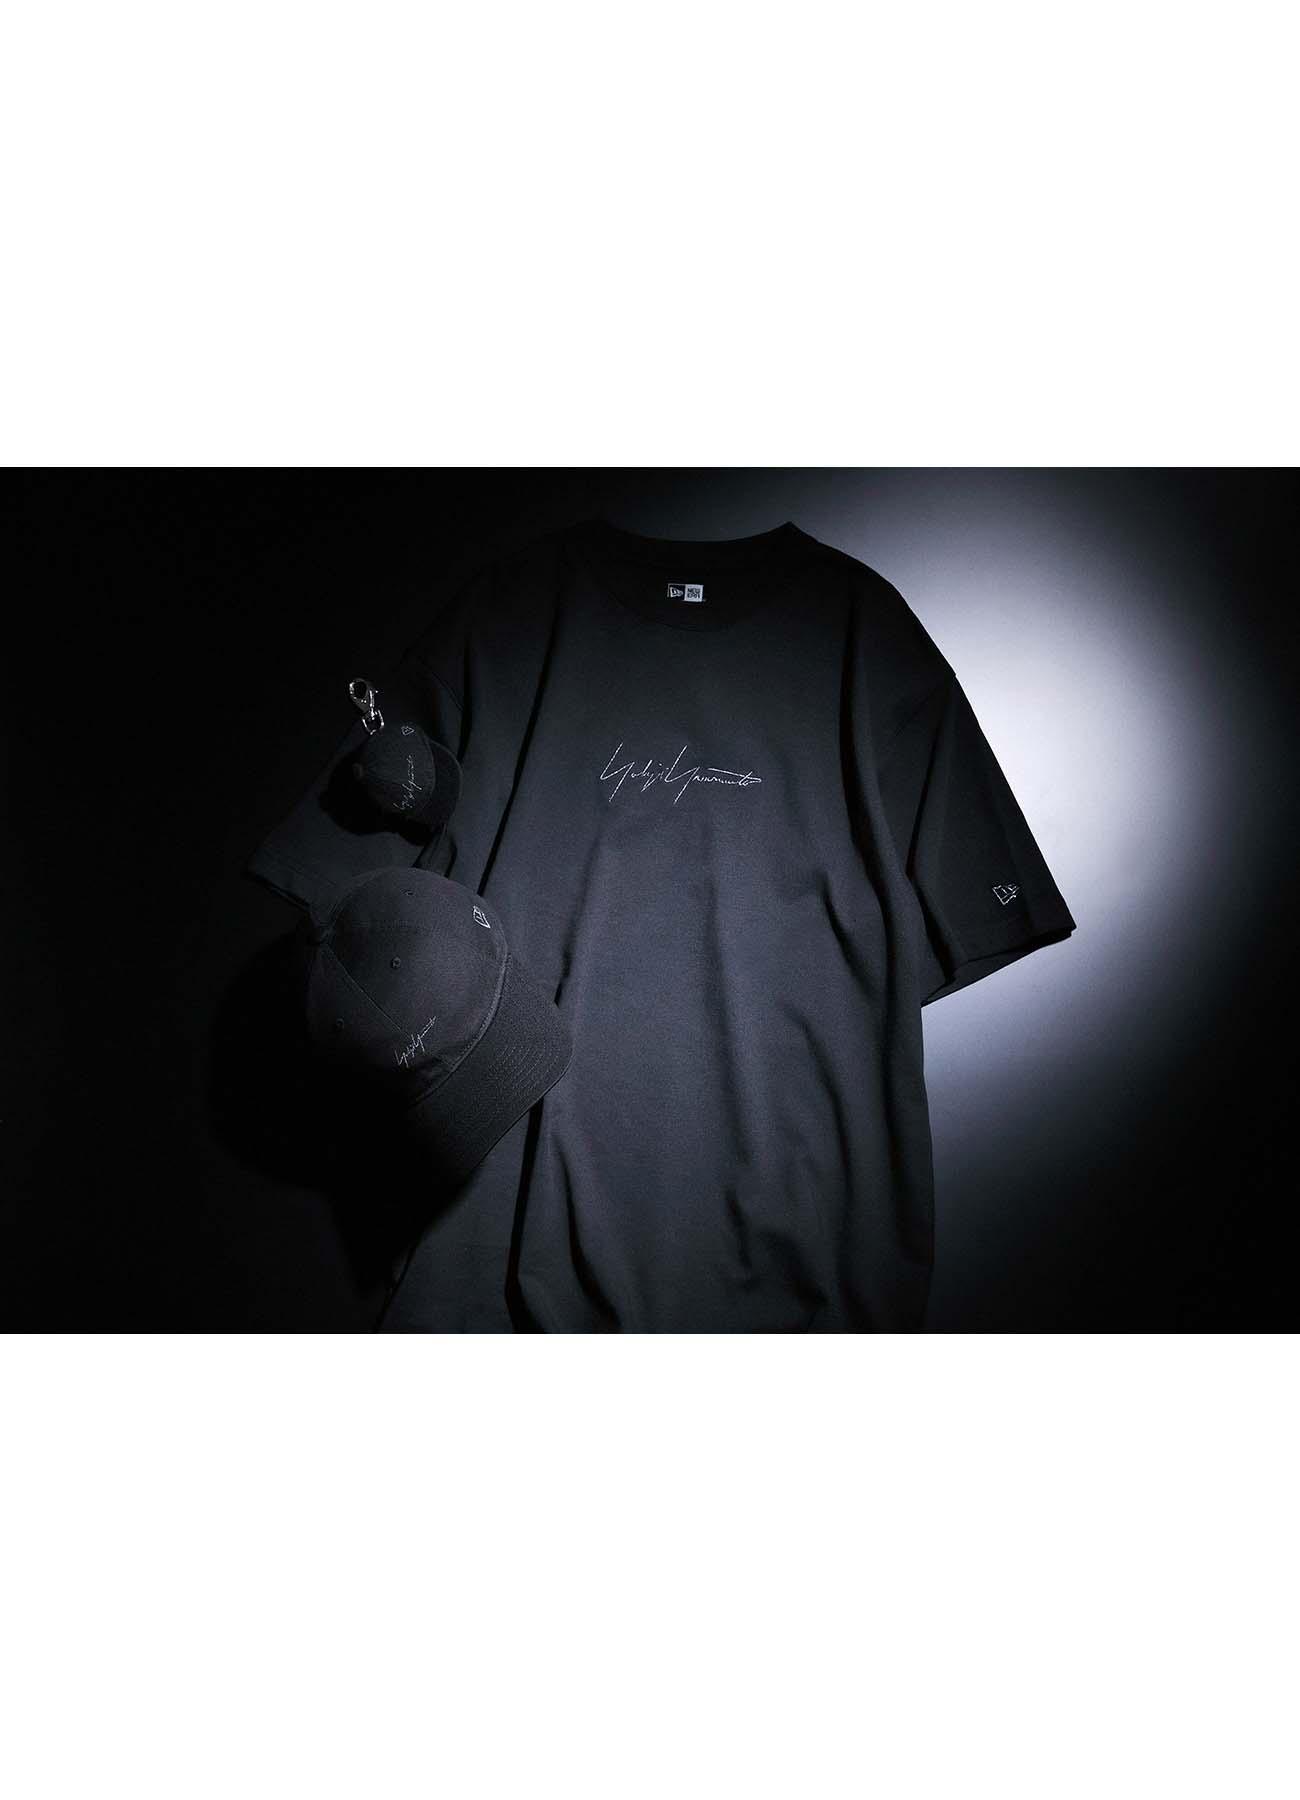 Yohji Yamamoto × New Era METALLIC BLACK SIGNATURE 9THIRTY